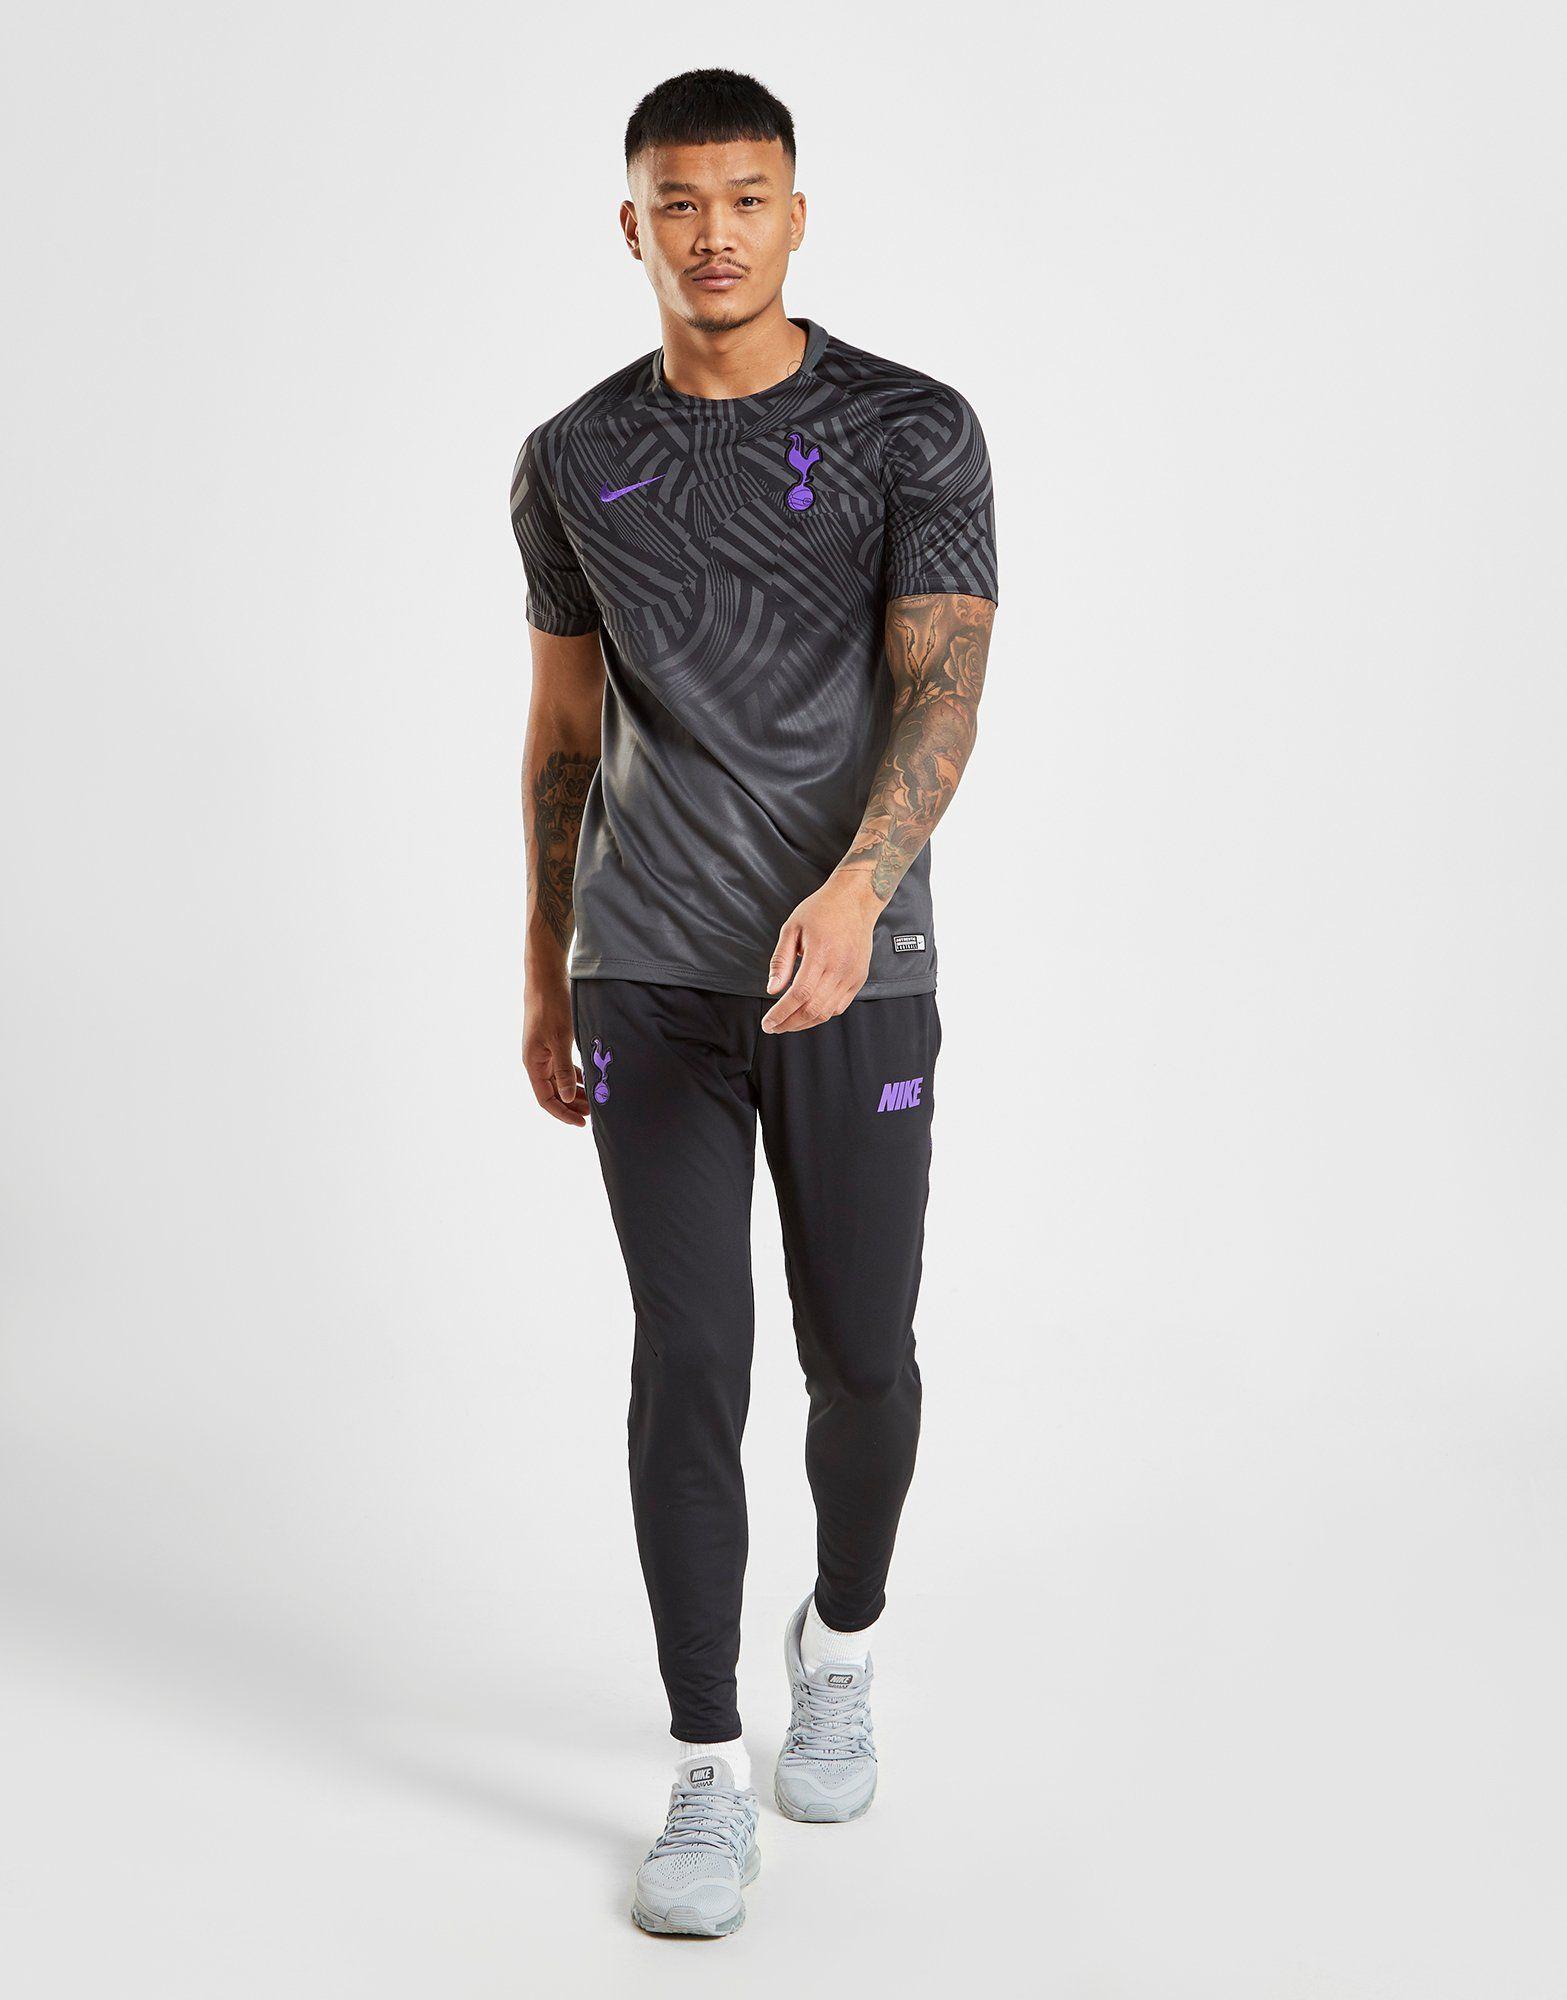 NIKE Tottenham Hotspur Dri-FIT Squad Men's Short-Sleeve Football Top